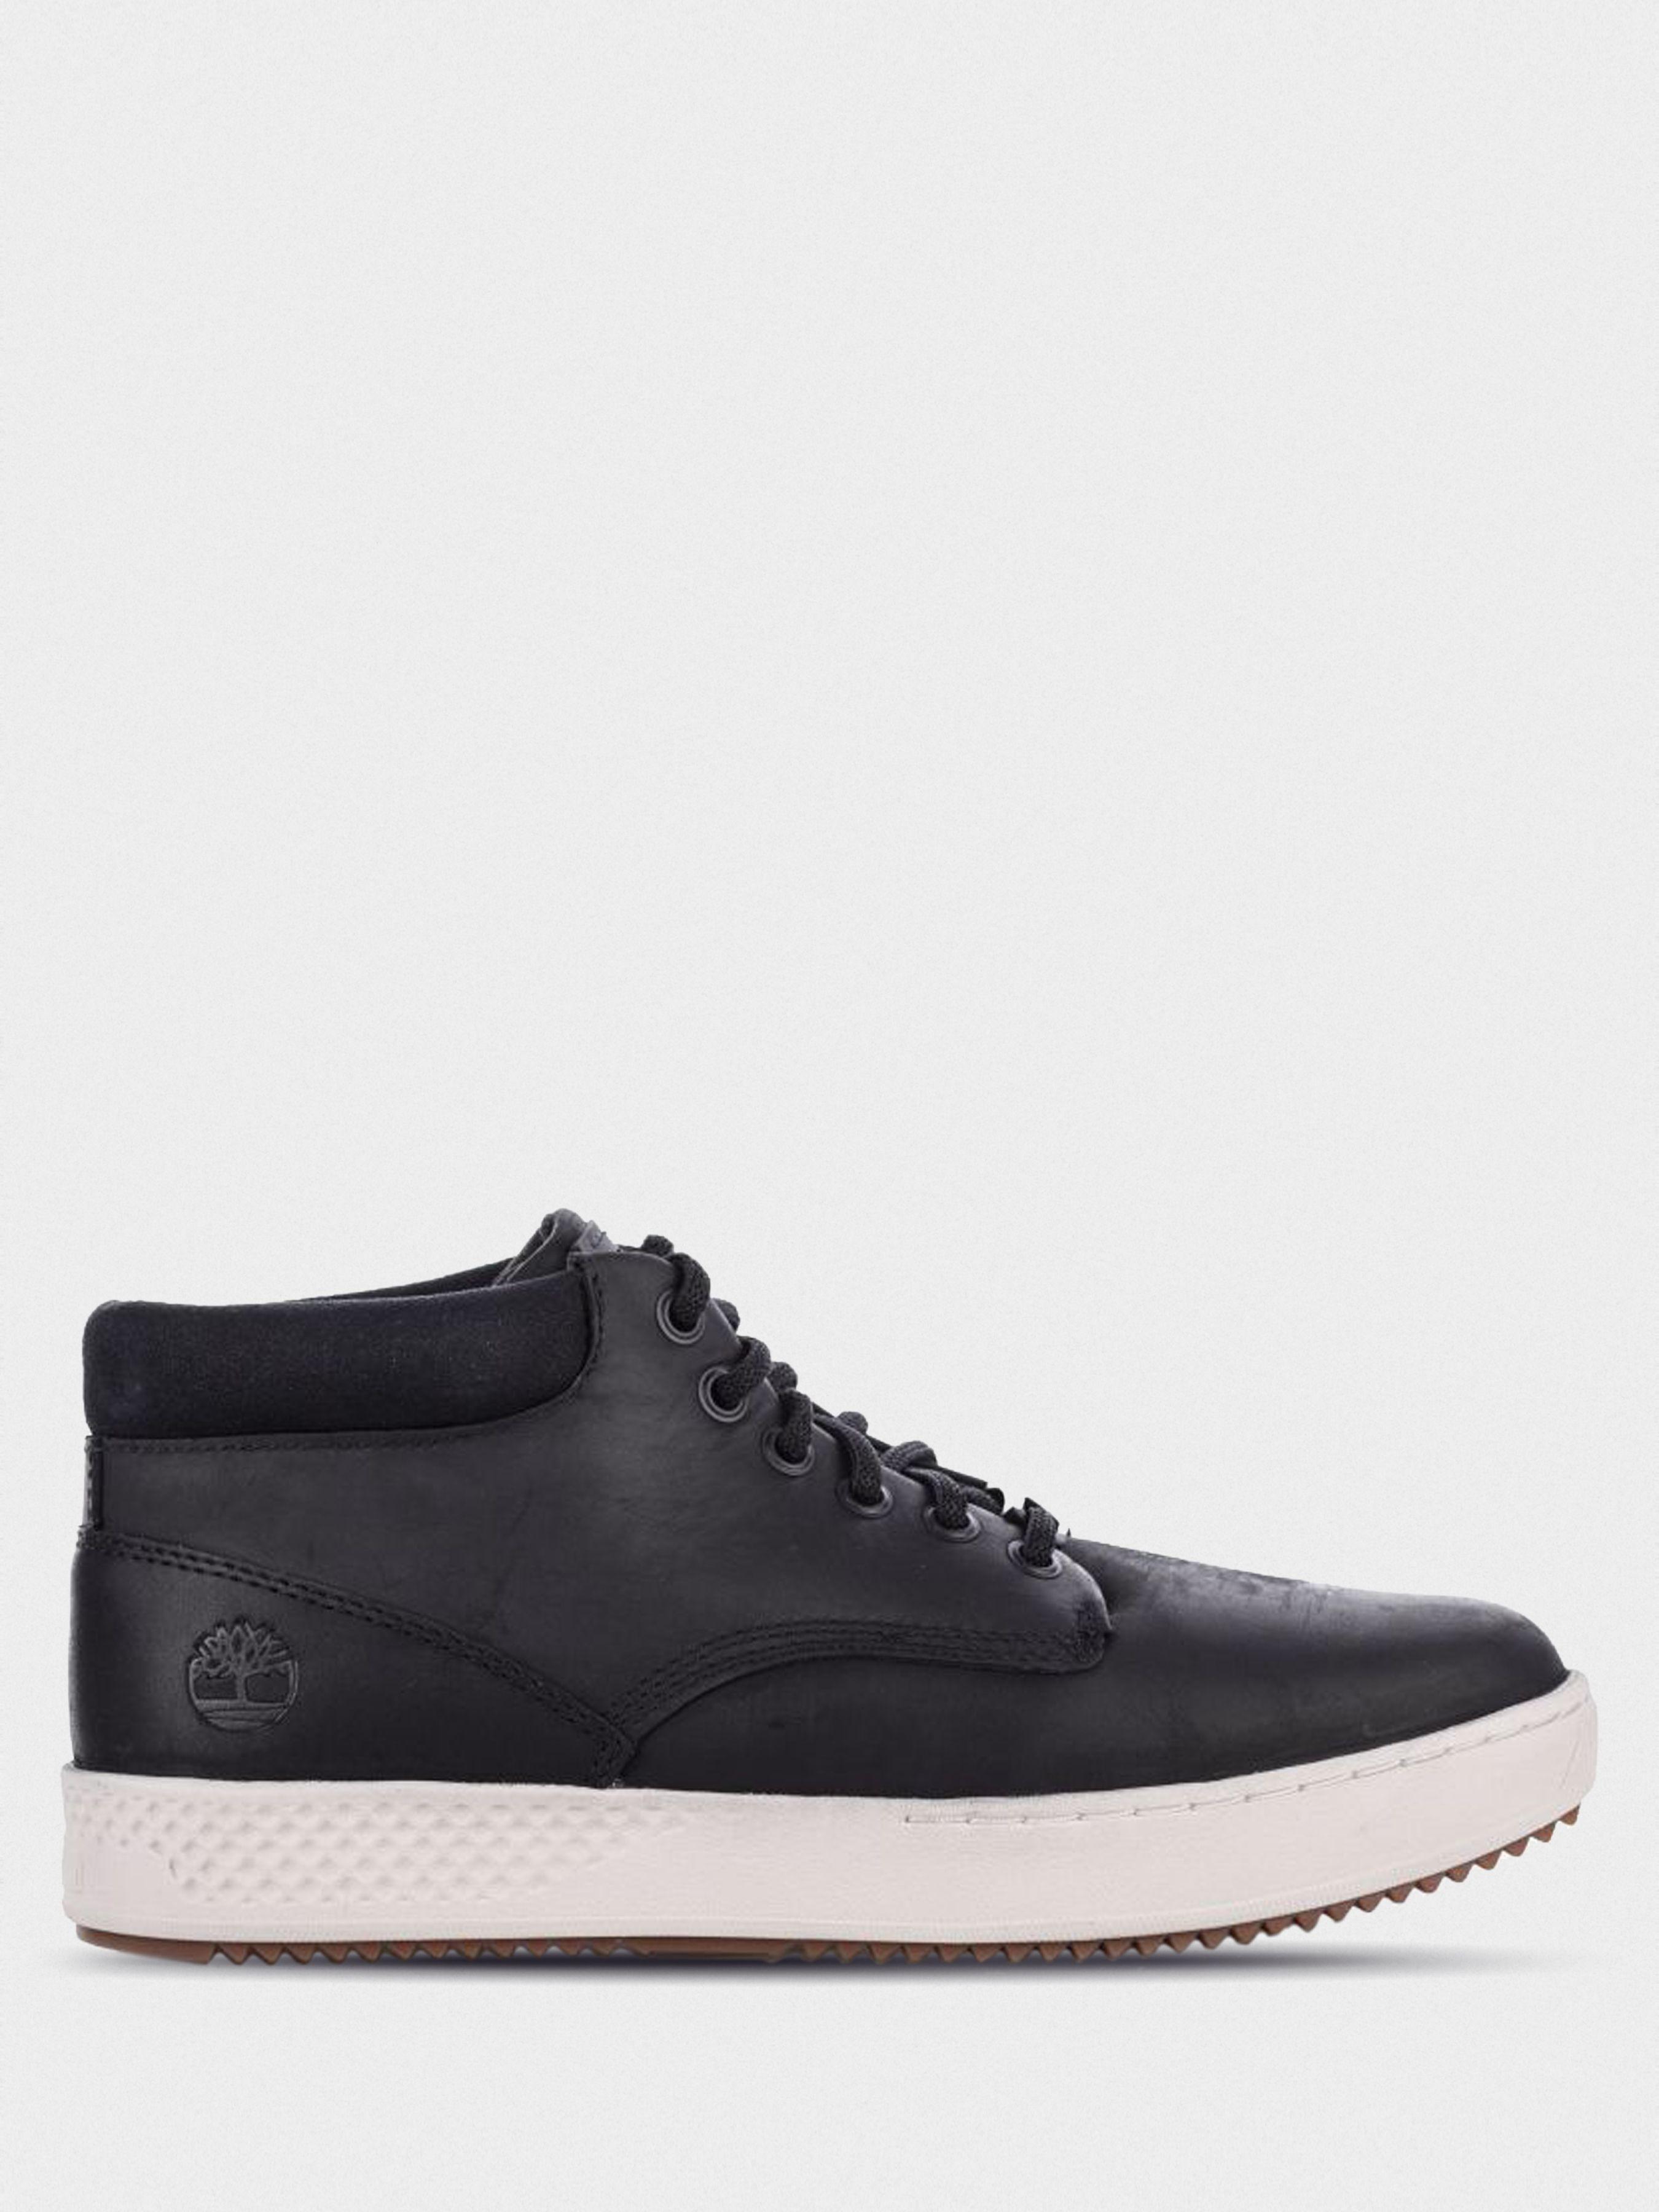 9a93a4b9565c Ботинки для мужчин Timberland CityRoam Cupsole TF3784 купить в Интертоп,  2017